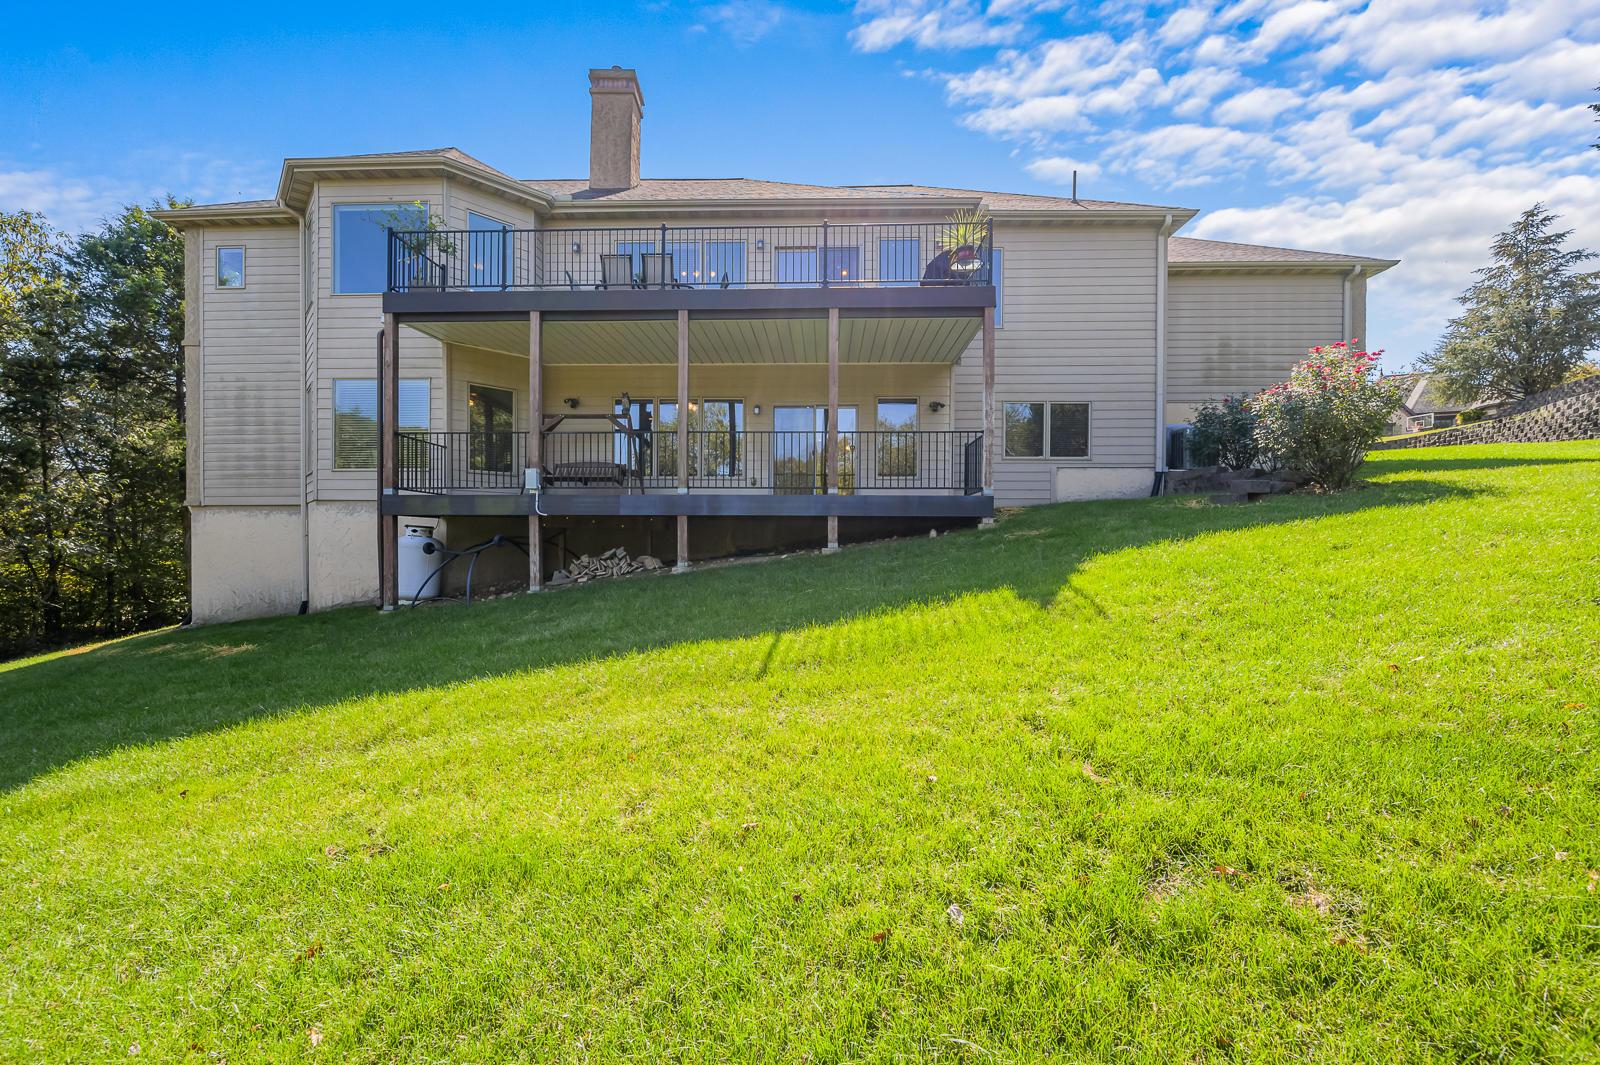 145 Roark Hills Drive Branson, MO 65616